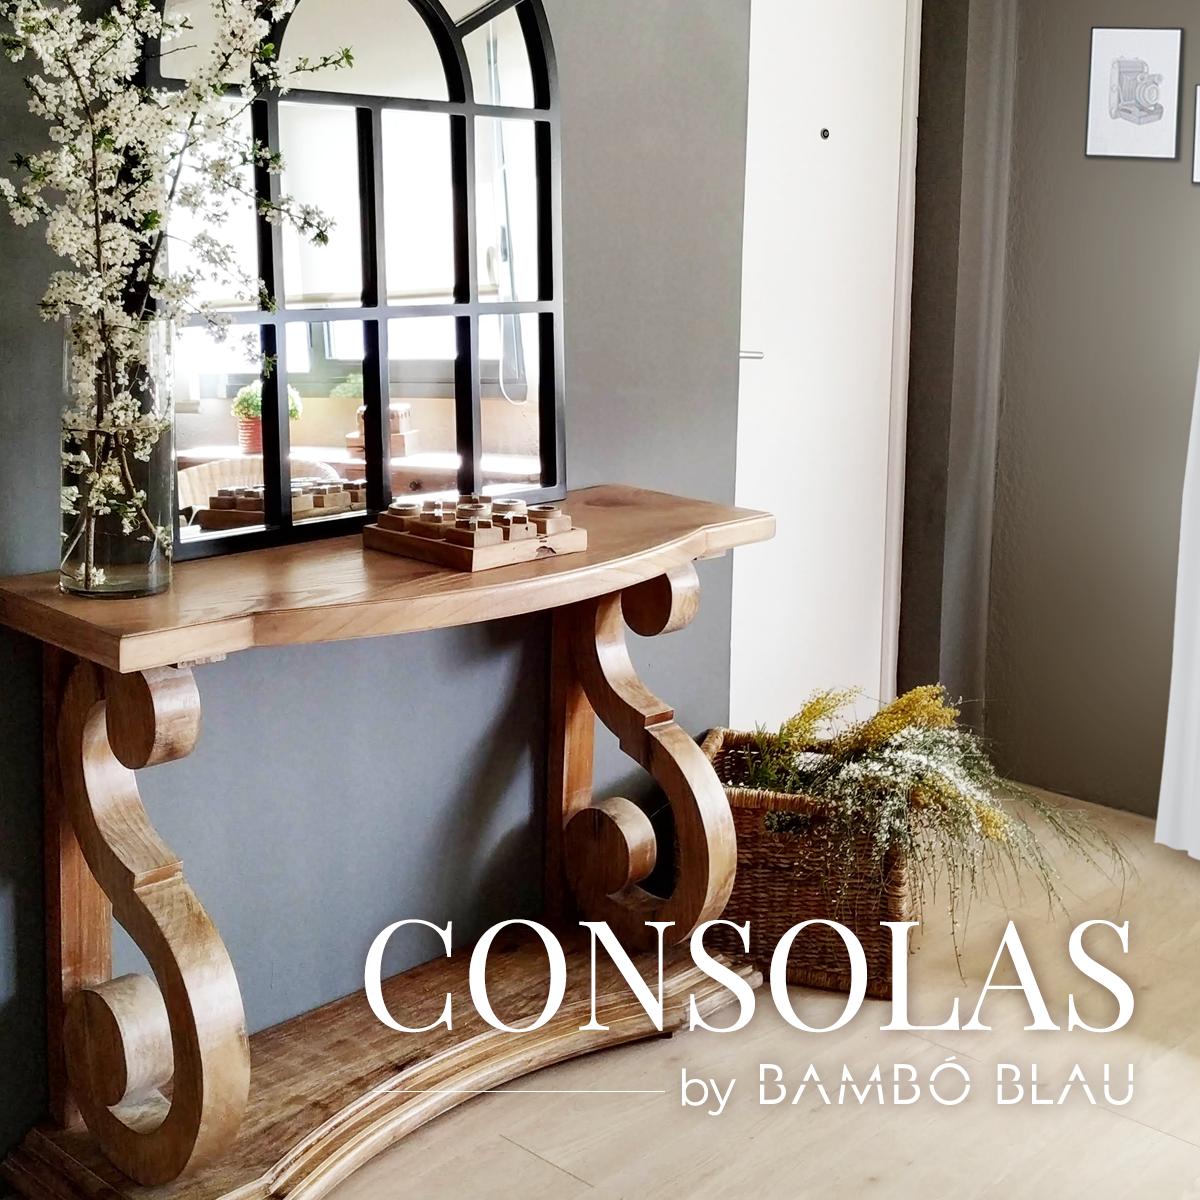 Consolas by Bambó Blau